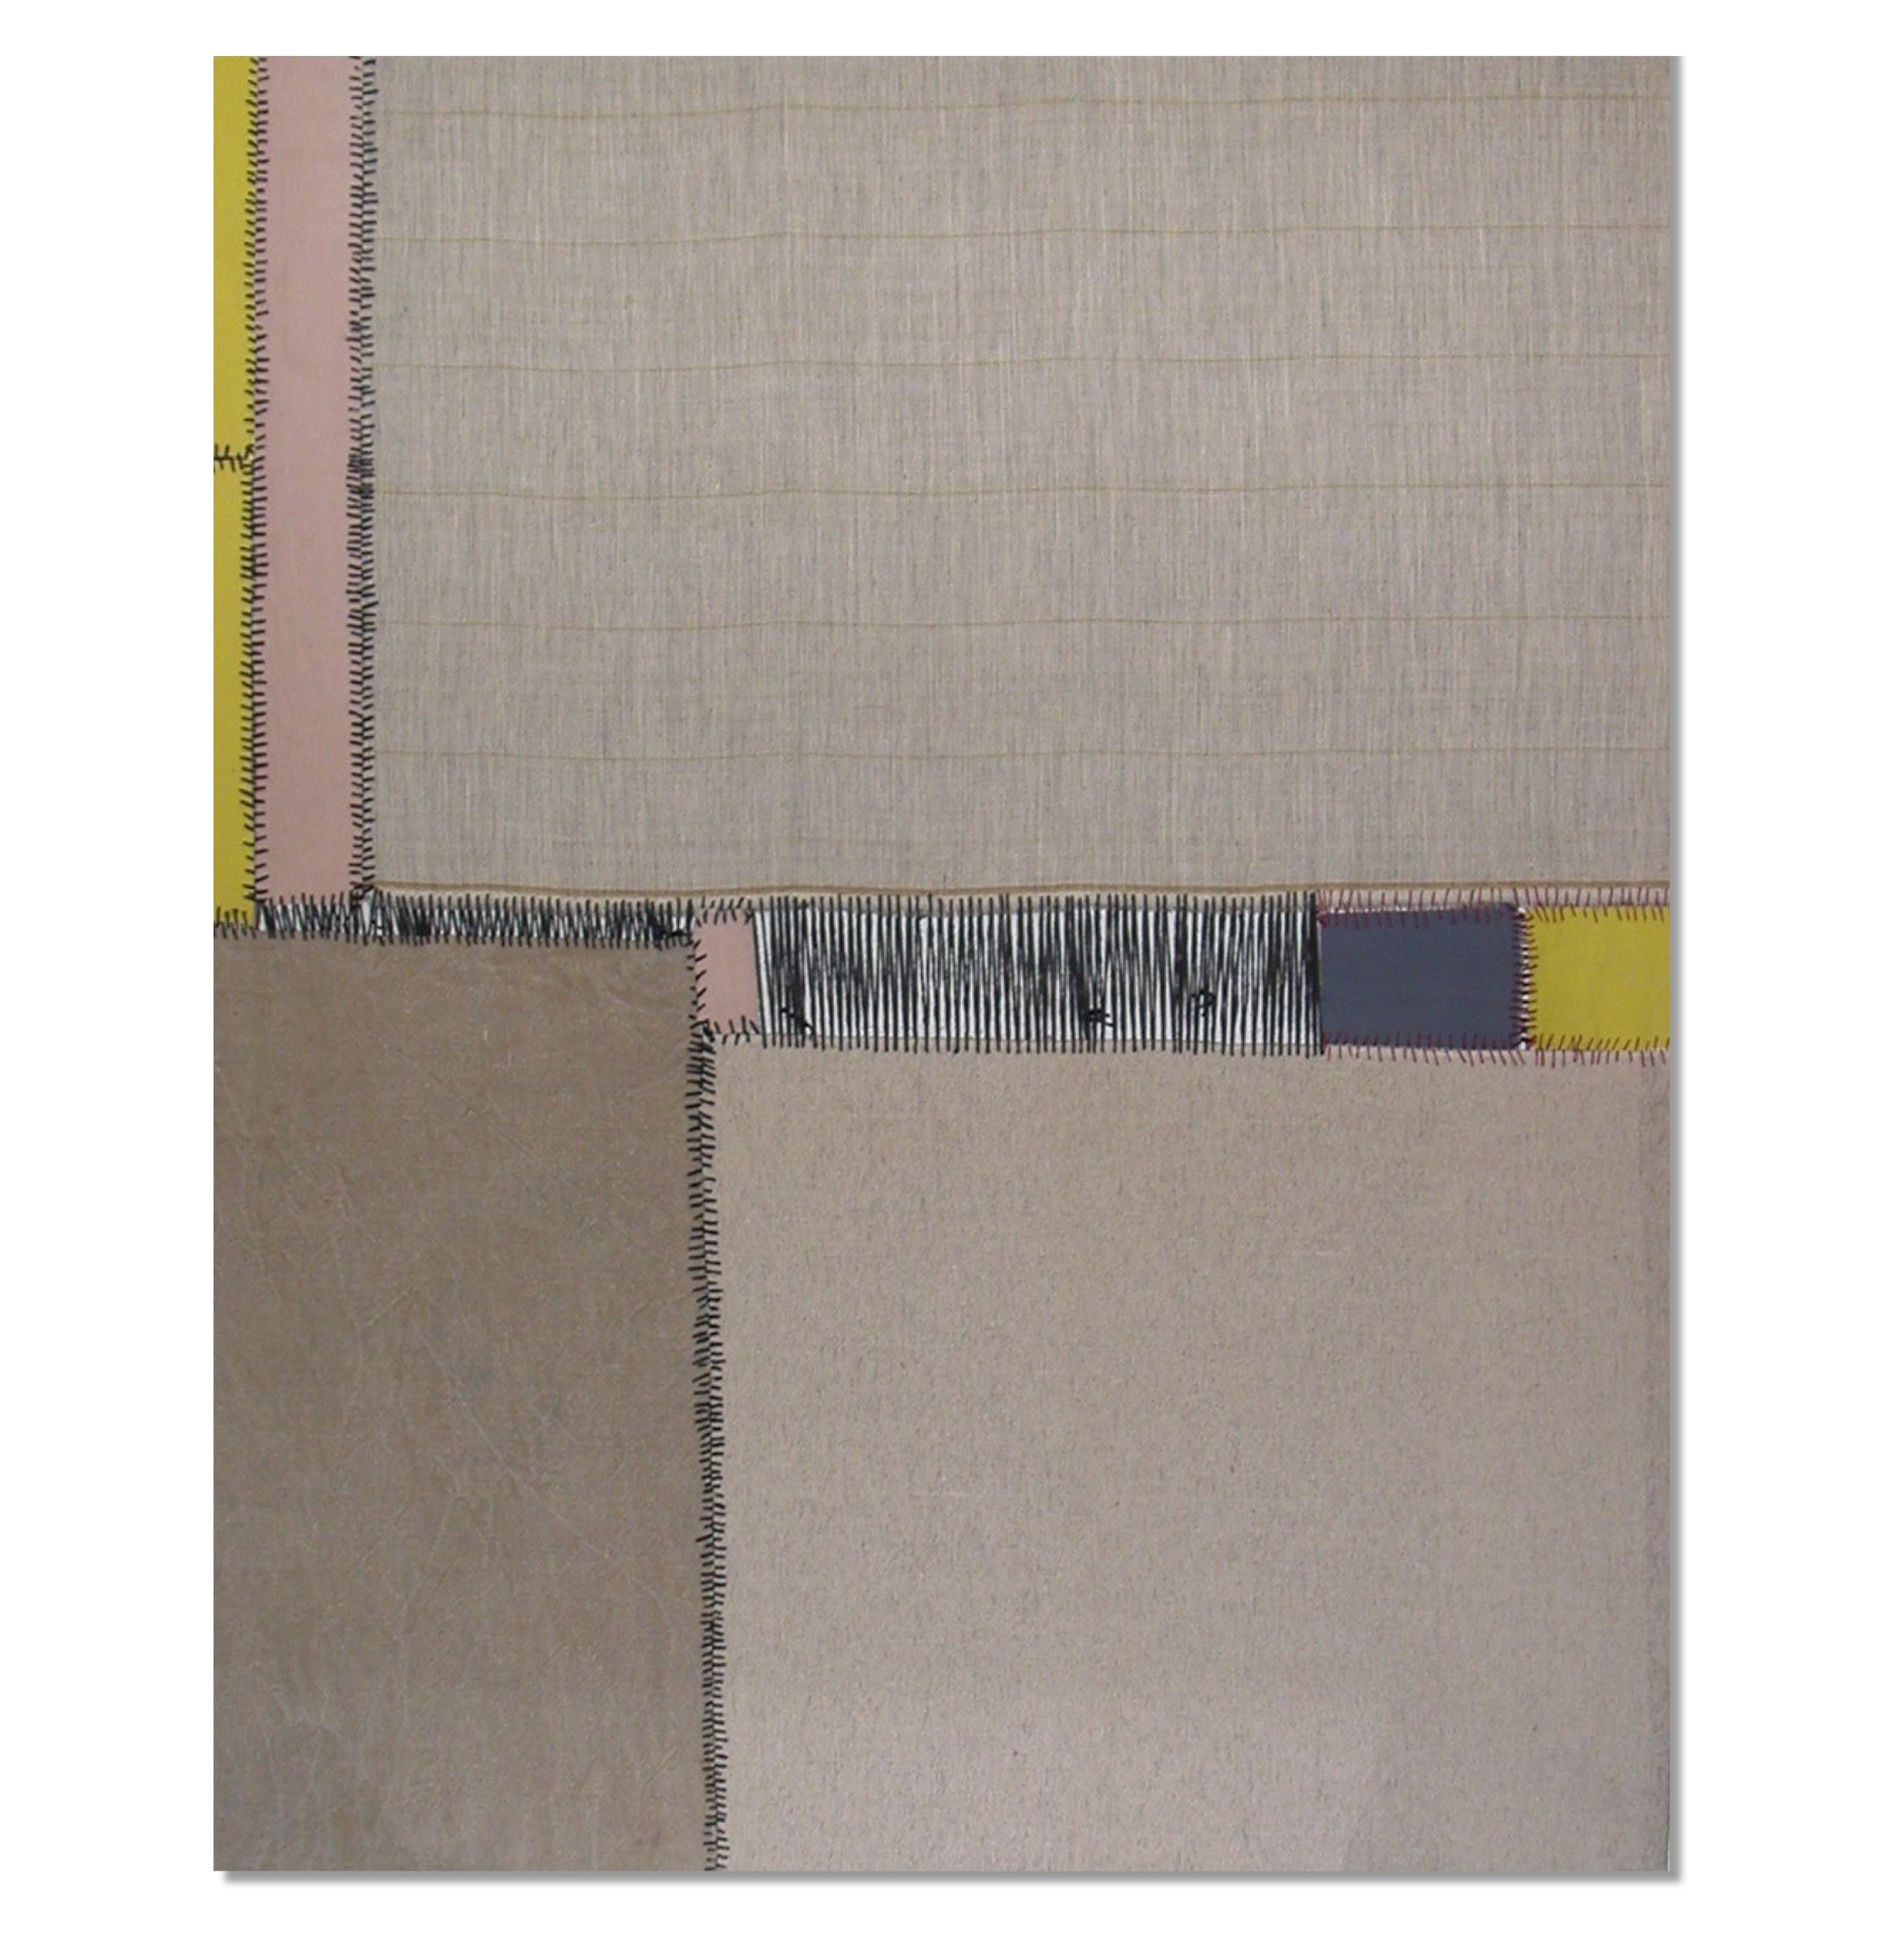 Teresa Lanceta - Norte. 2004. Tejido cosido y pintado. 146 x 114 cm.